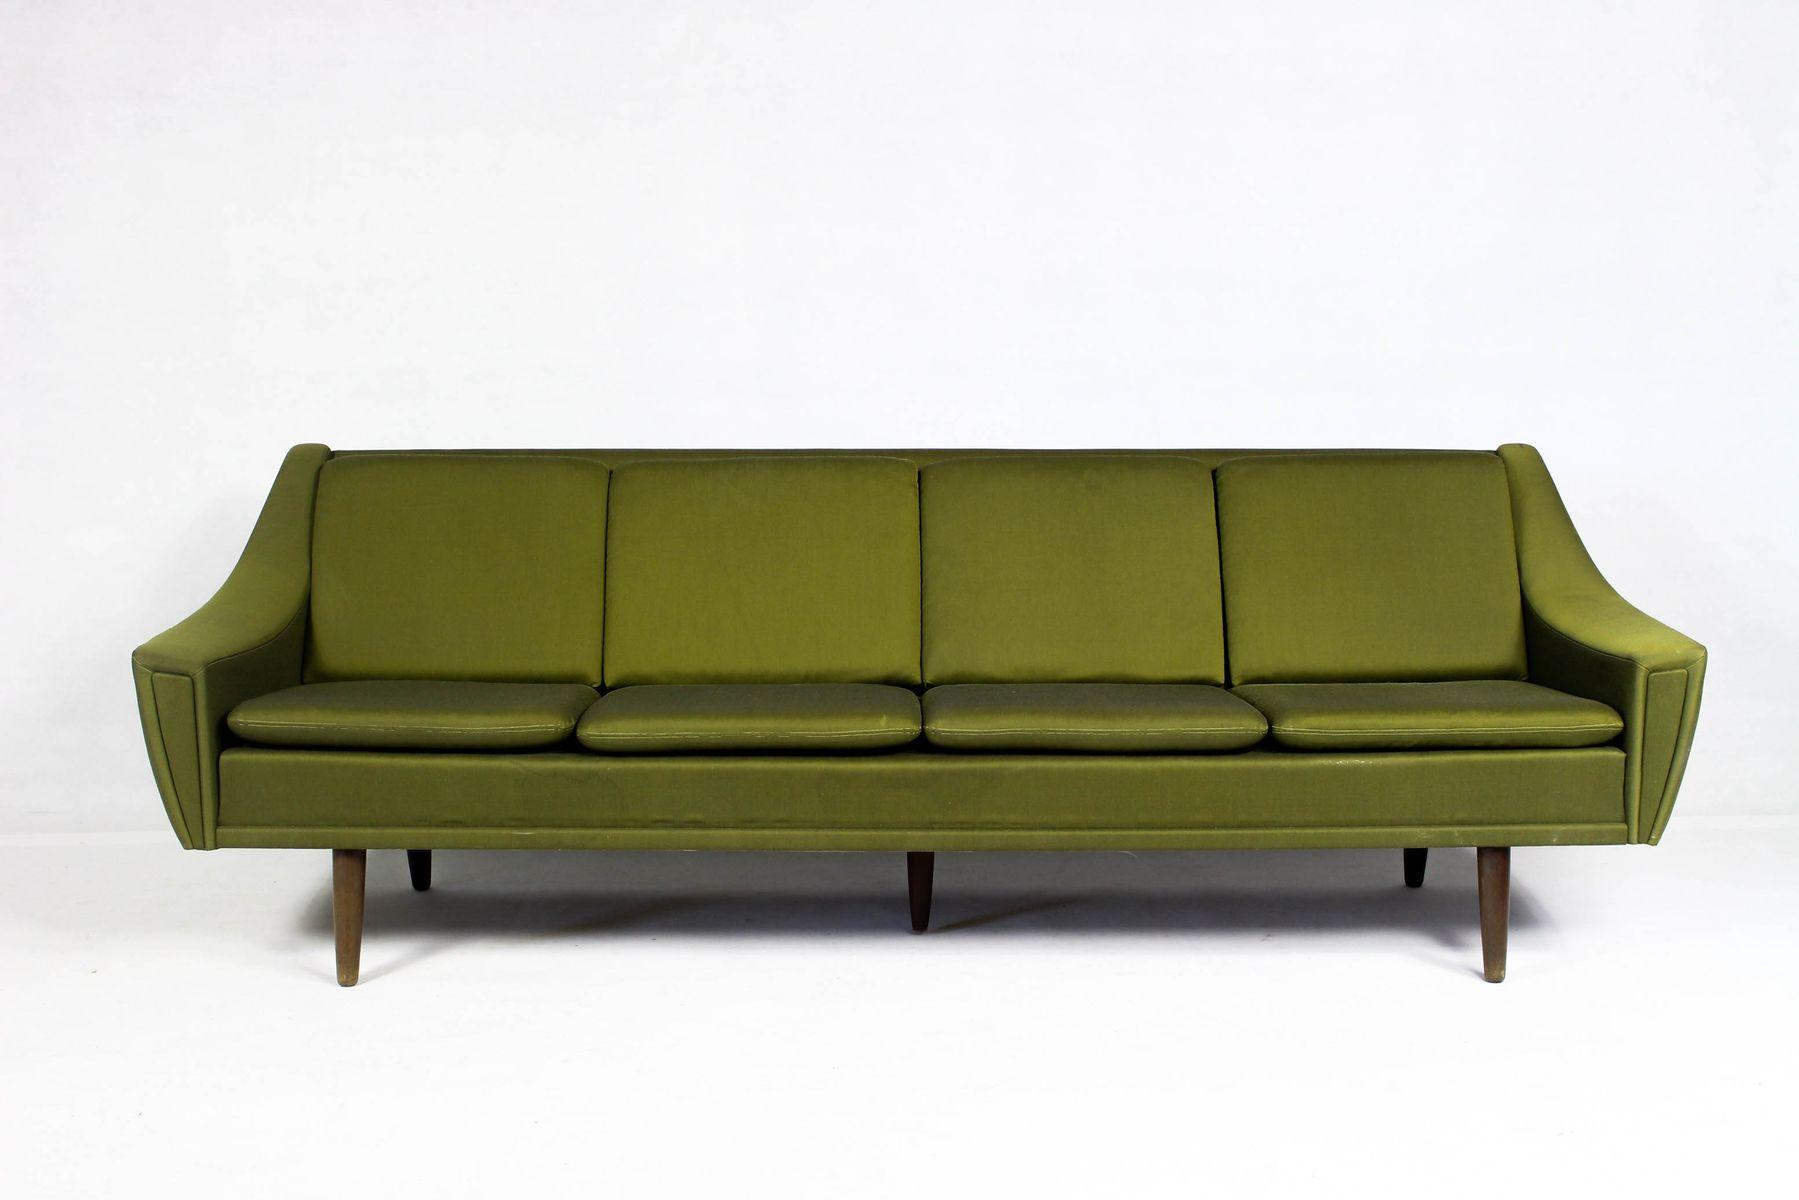 Mid-Century Danish Modern Sofa for sale at Pamono